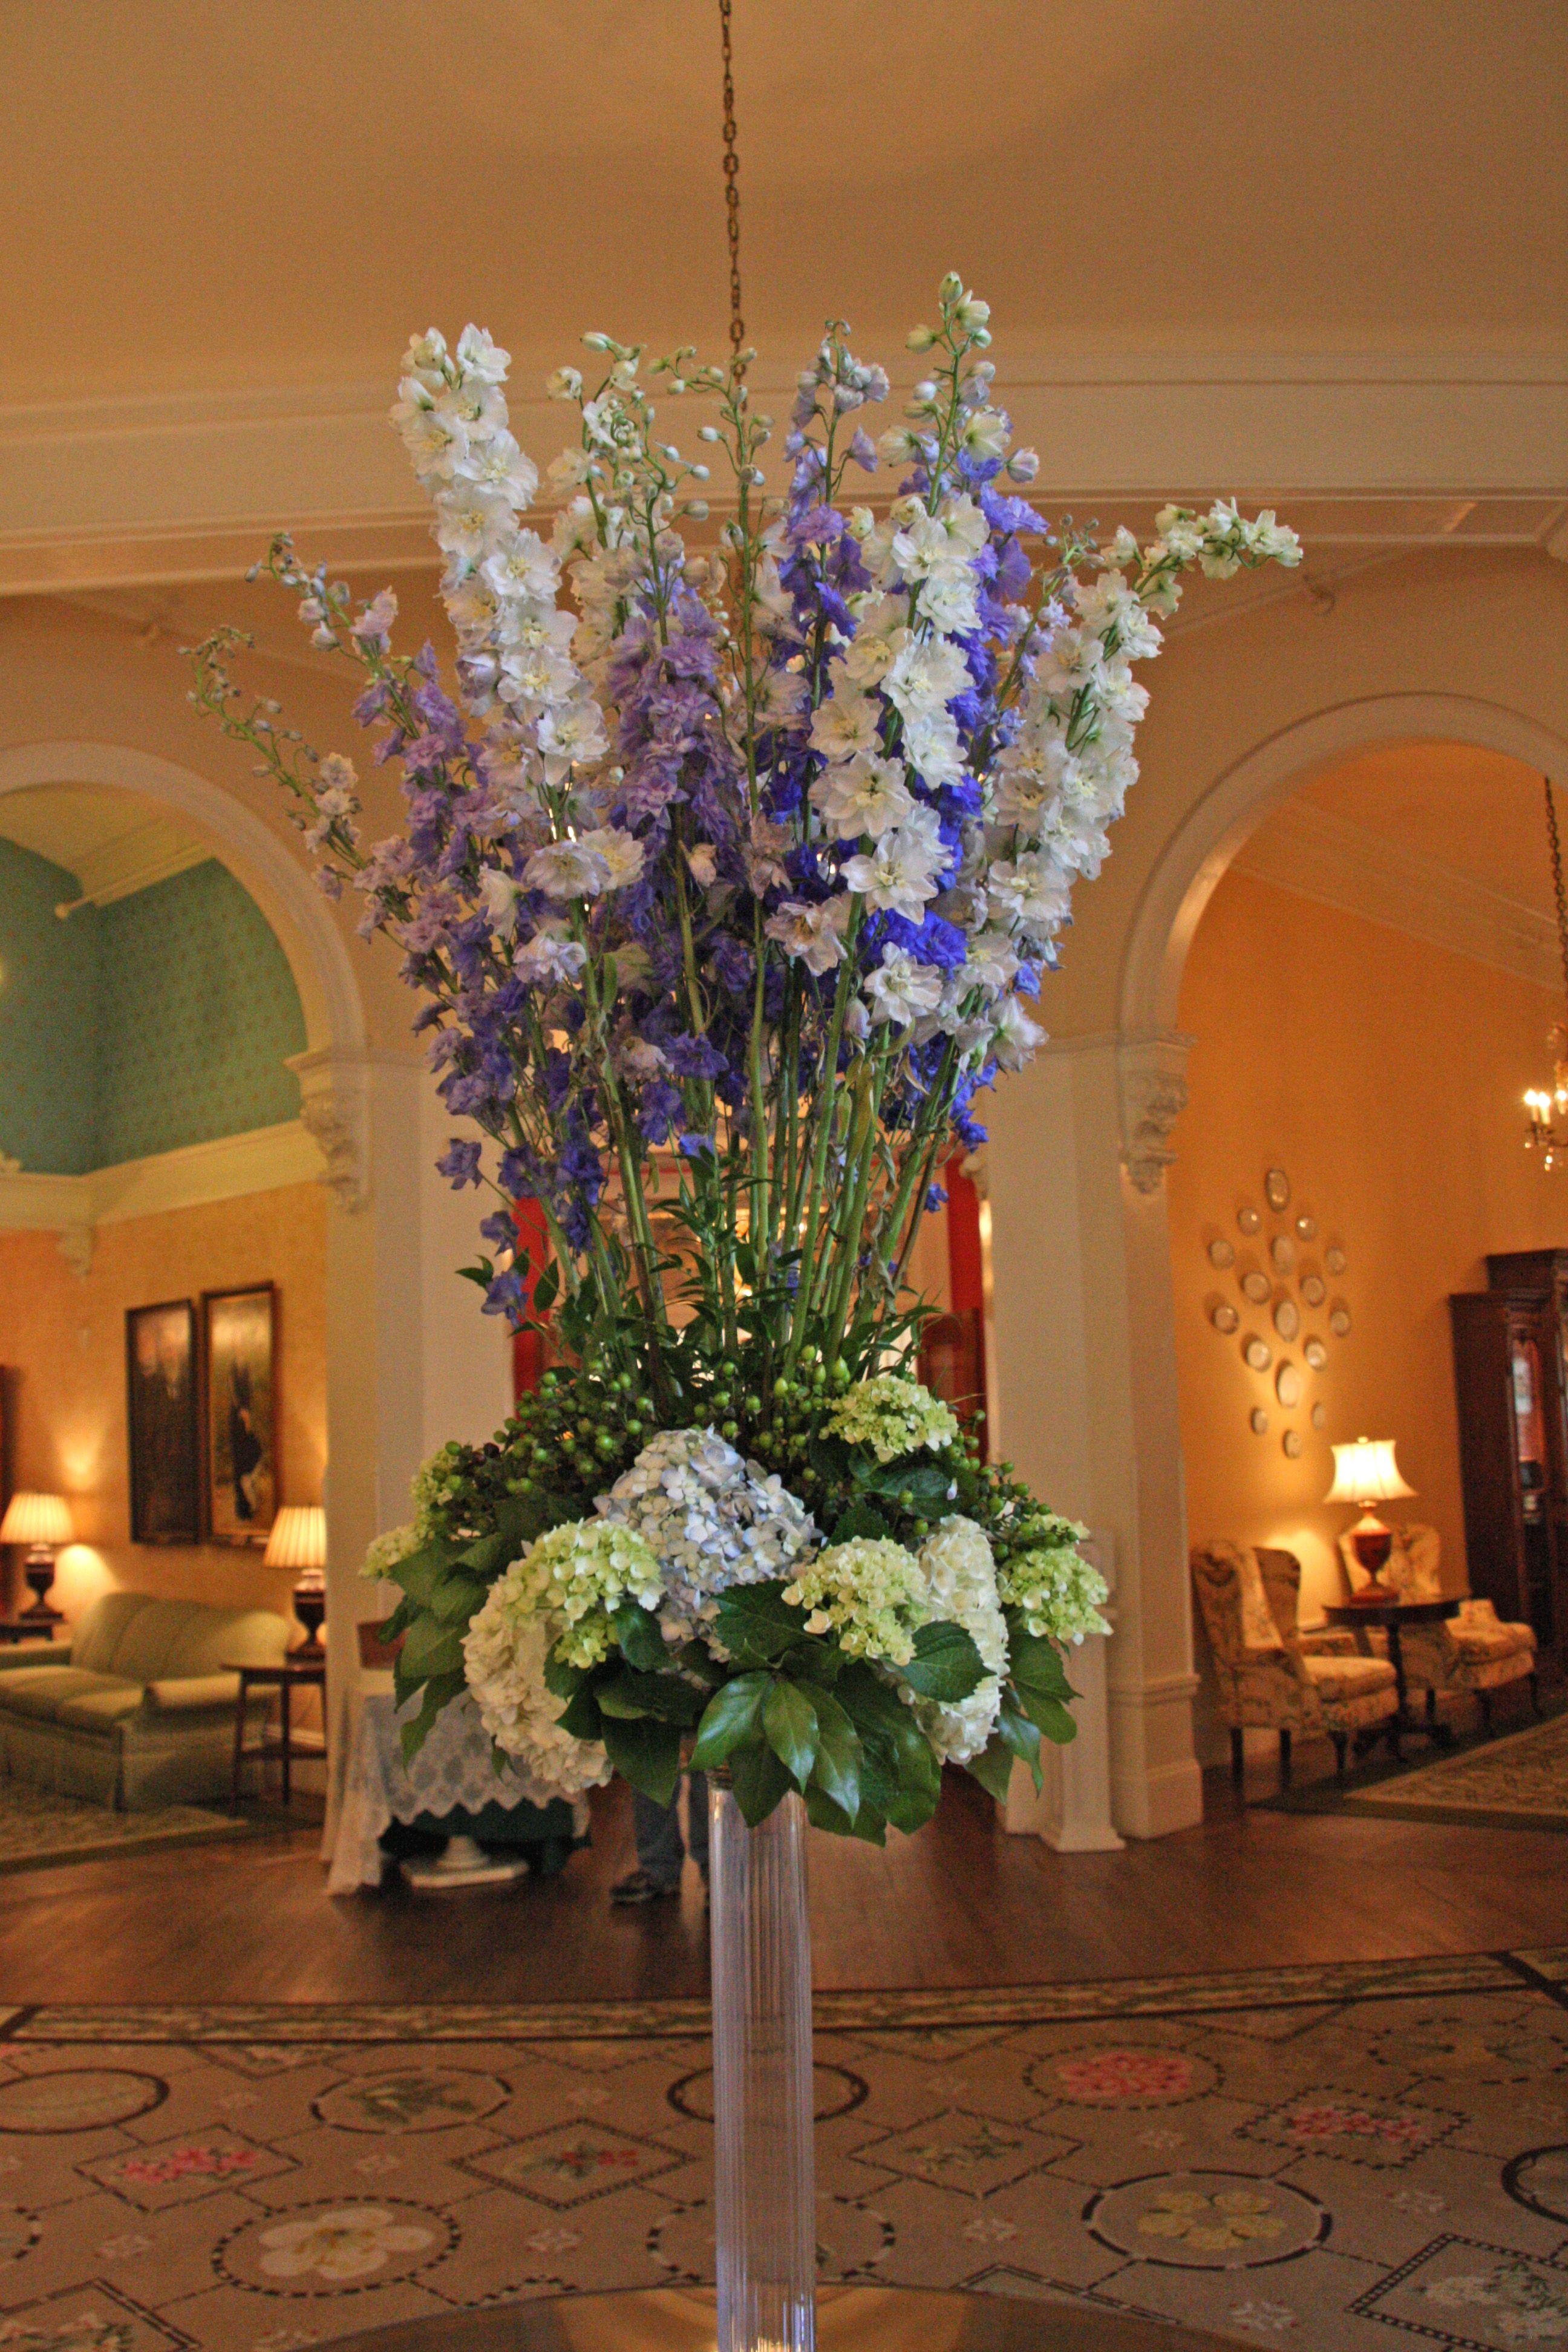 Omni Mount Washington Hotel Resor Lobby Flower